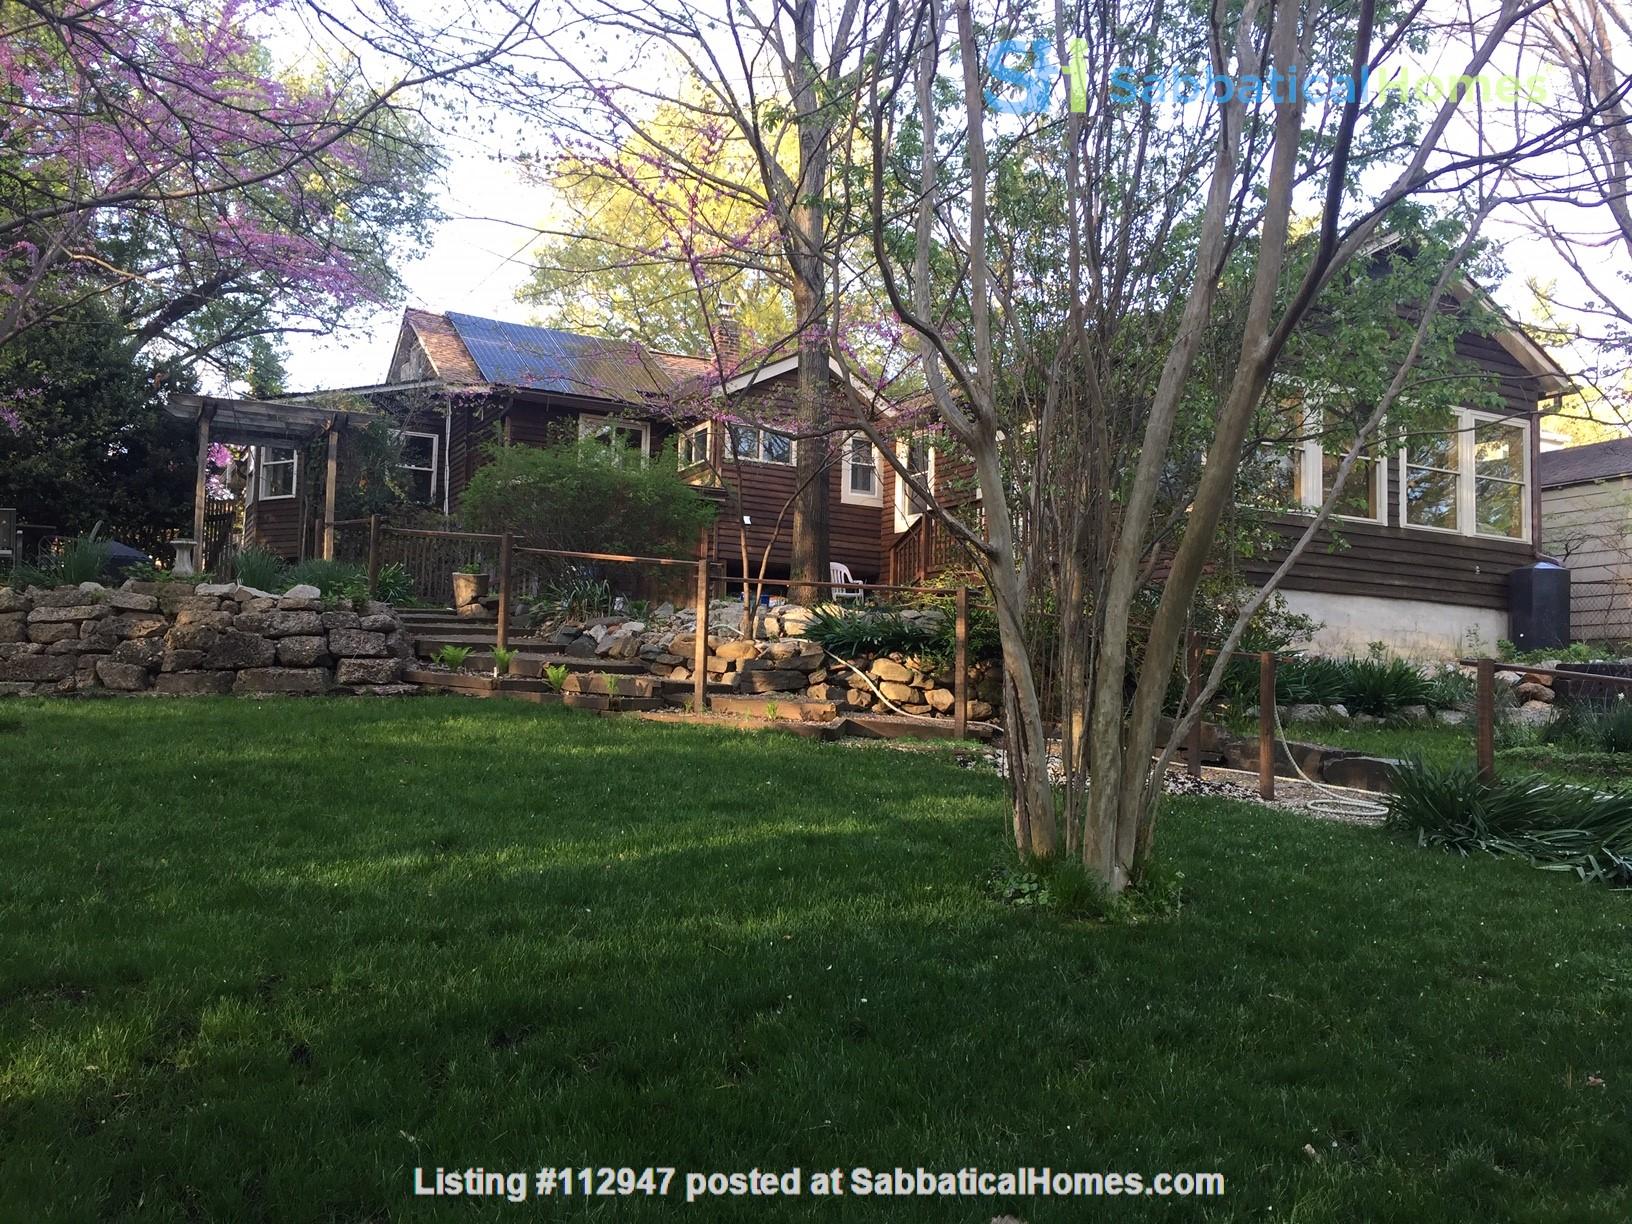 Summer 2021 Rental in Takoma Park, MD Home Rental in Takoma Park, Maryland, United States 1